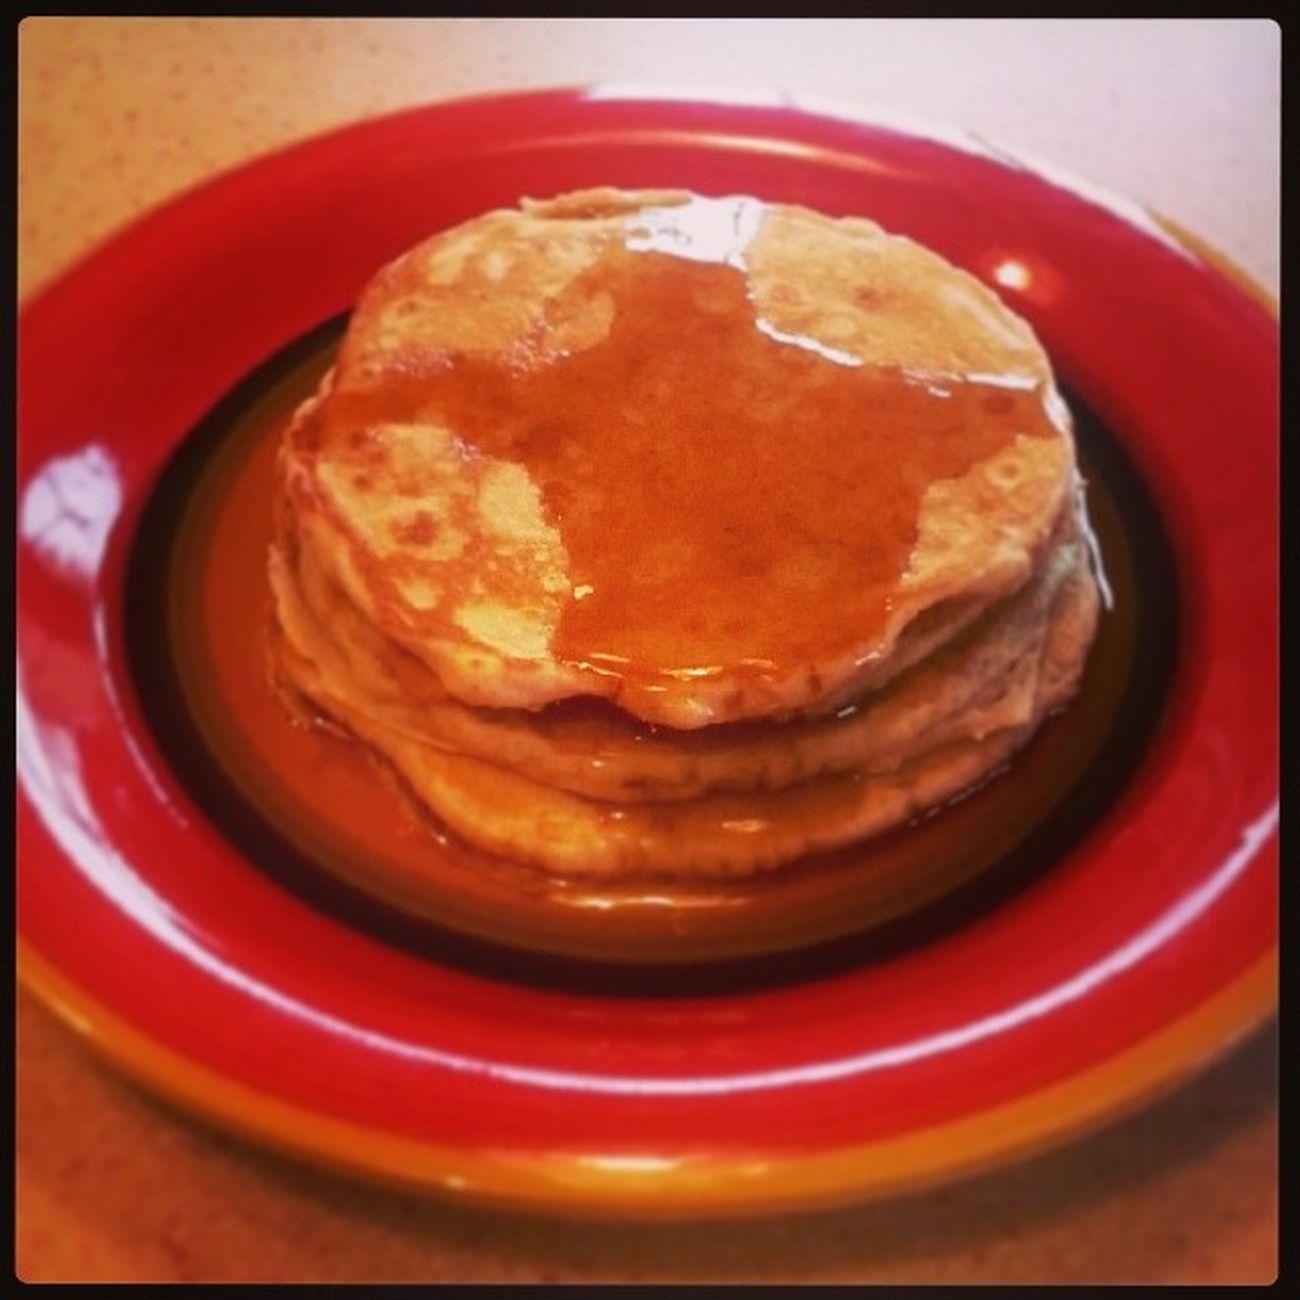 Who needs Ihop. Free pancake day at the Kelly's house lml. ImAboutToTearTheseUp KindaWishIHadIHOPTho NotGonnaLie